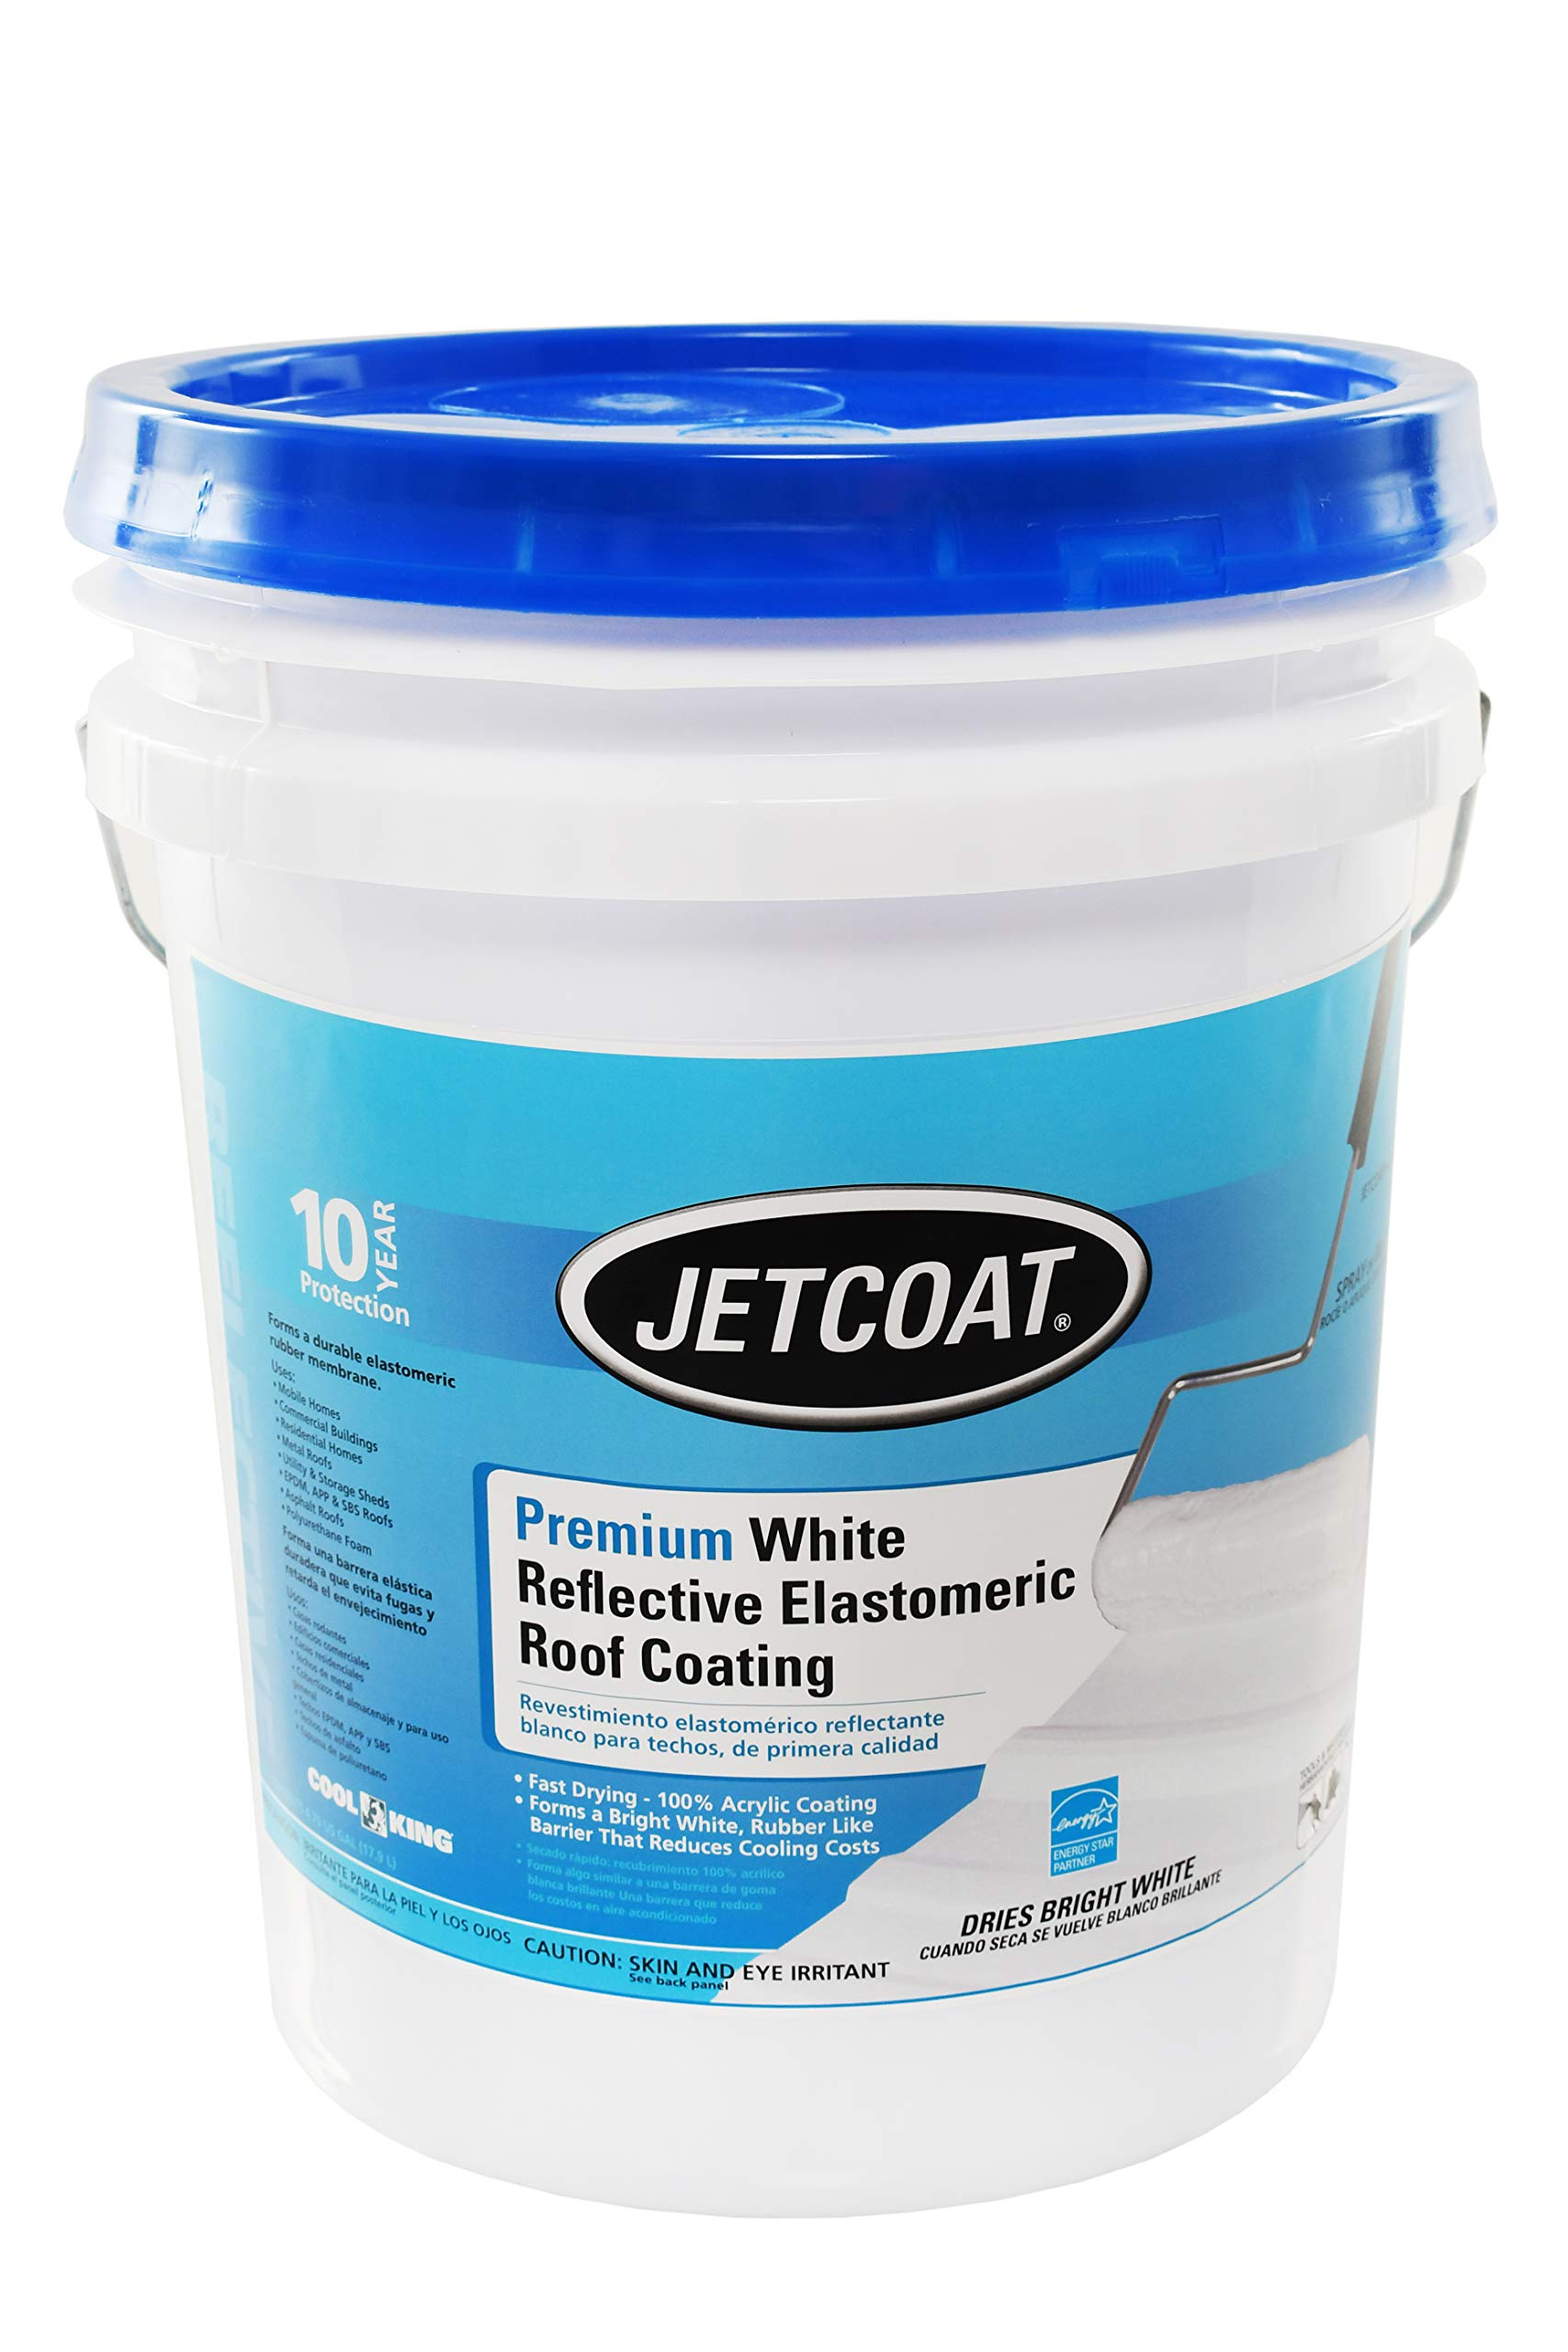 Jetcoat Cool King Elastomeric Acrylic Reflective Roof Coating, White, 5 Gallon, 10 Year Protection